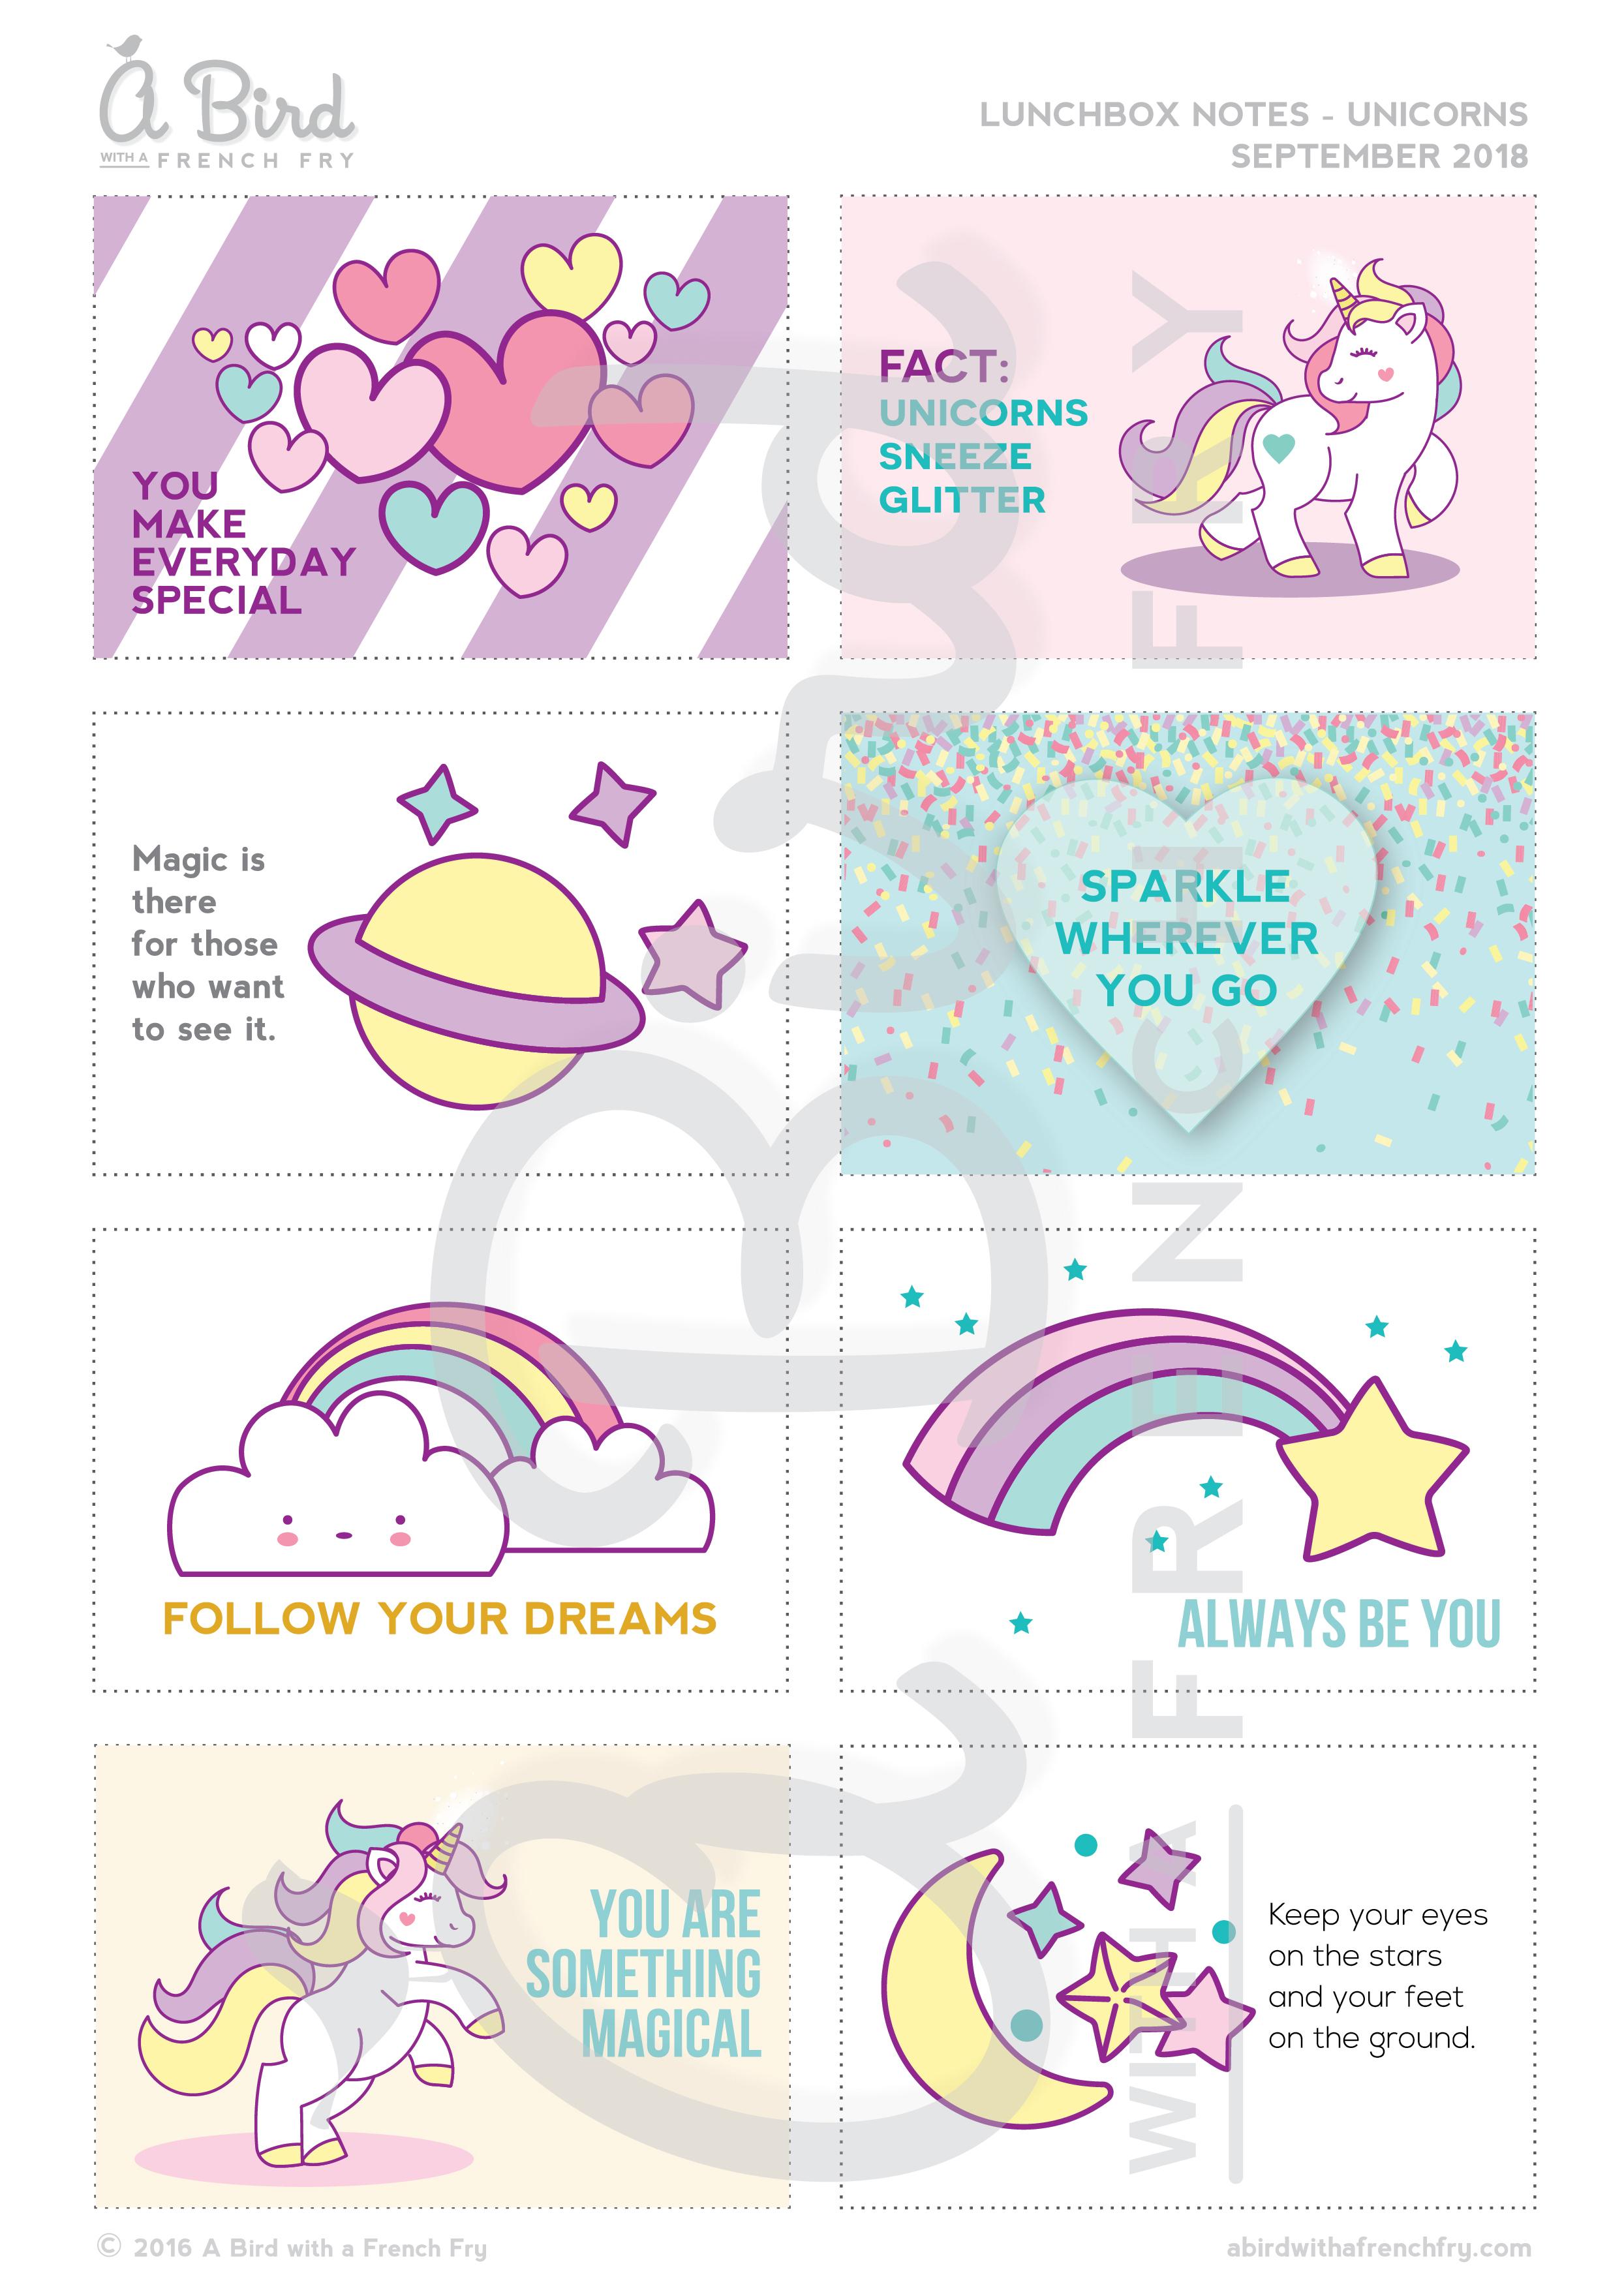 Lunchbox Notes - Unicorns & Rainbows